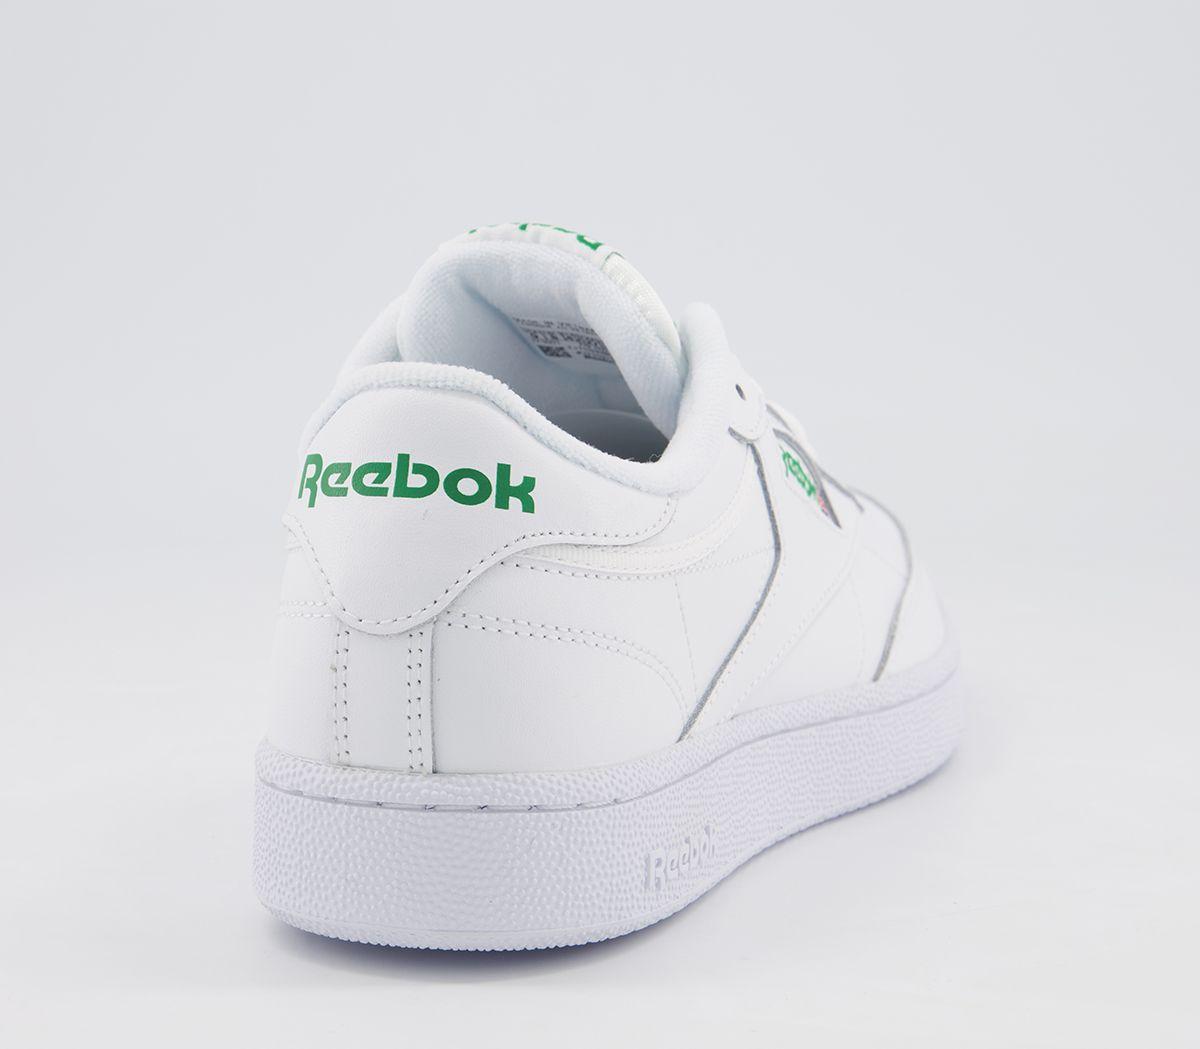 d7488db6542 Reebok Club C 85 White Green - His trainers